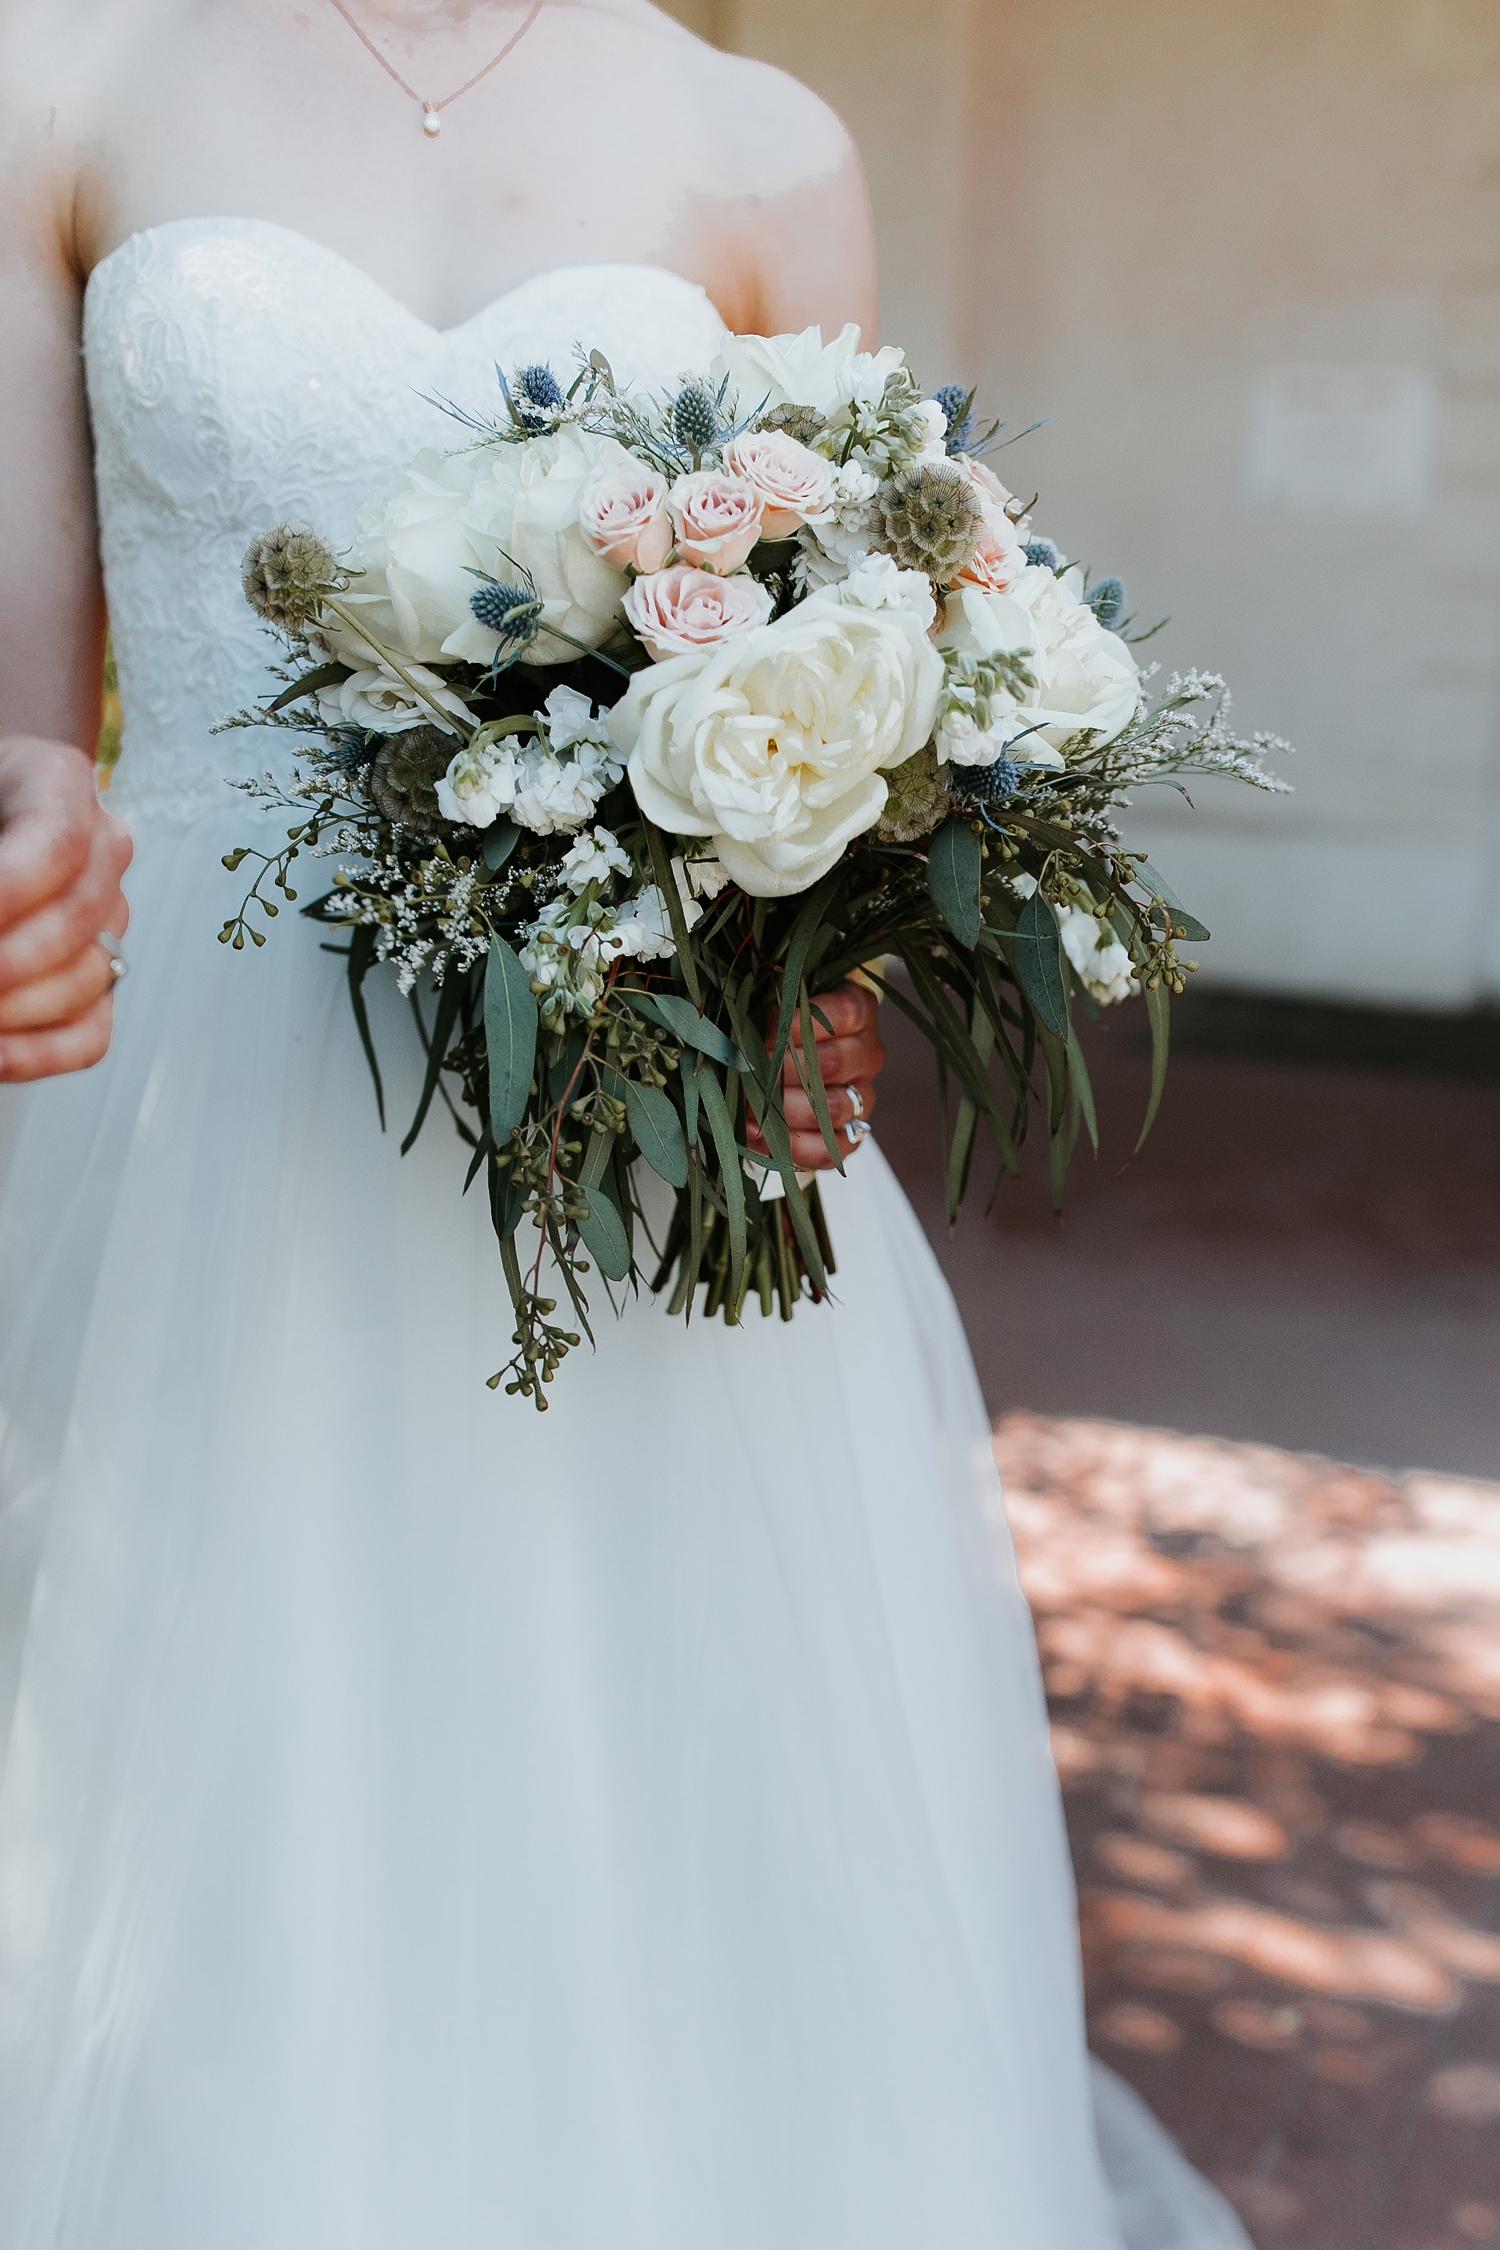 Alicia+lucia+photography+-+albuquerque+wedding+photographer+-+santa+fe+wedding+photography+-+new+mexico+wedding+photographer+-+wedding+flowers+-+summer+wedding+flowers_0045.jpg